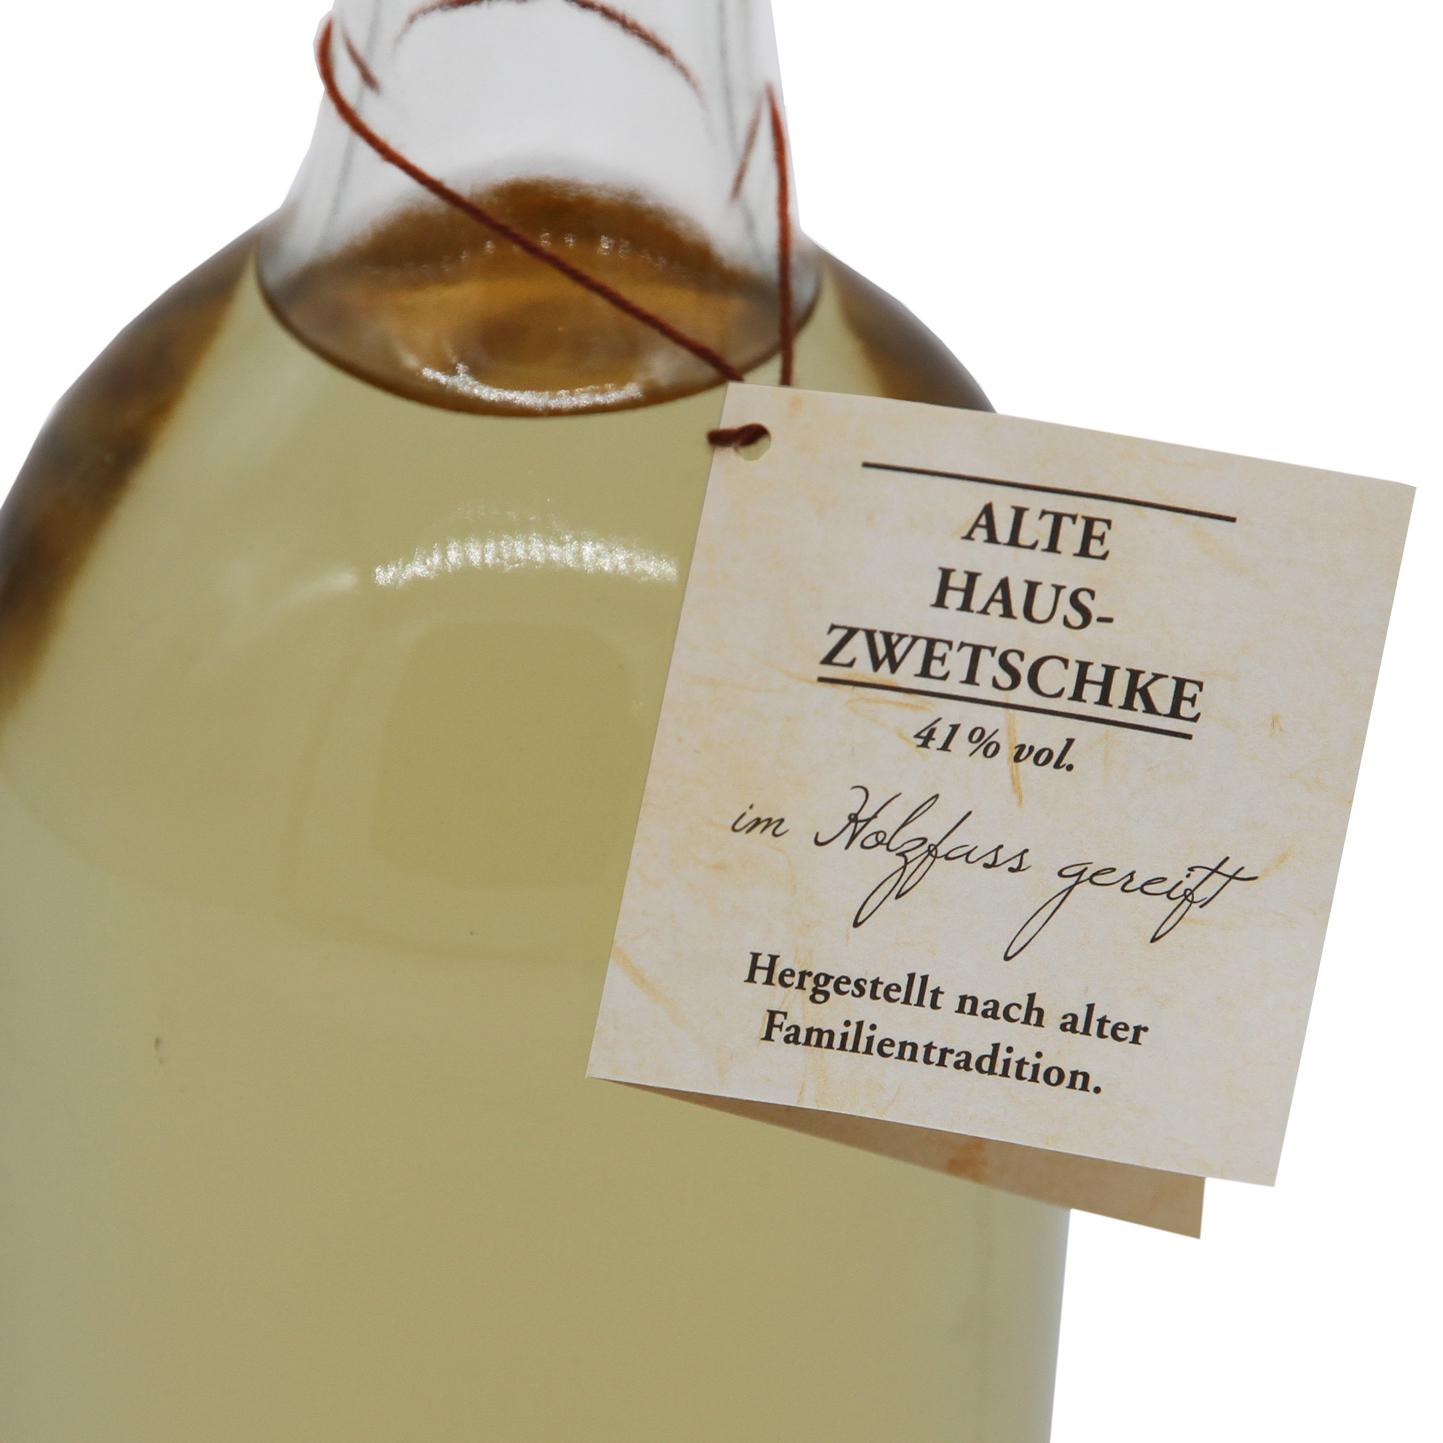 Prinz Alte Haus-Zwetschke, 1 L